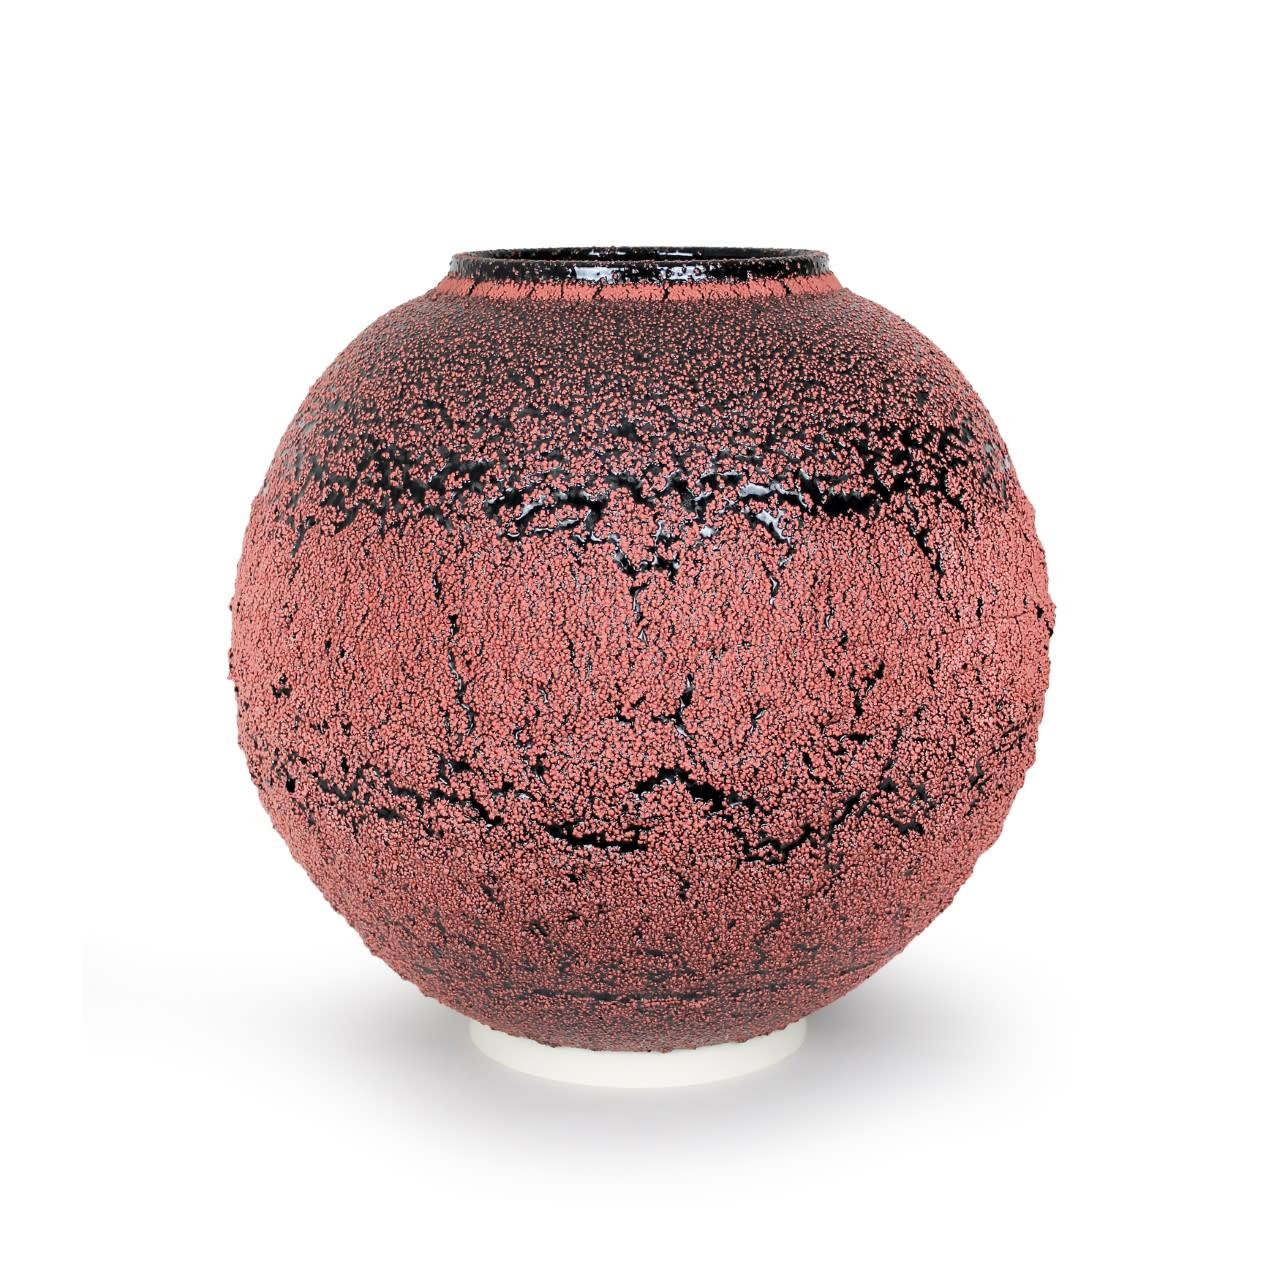 "<span class=""link fancybox-details-link""><a href=""/exhibitions/45/works/artworks3422/"">View Detail Page</a></span><div class=""artist""><strong>Albert Montserrat</strong></div><div class=""title""><em>Cadmium Jar</em>, 2020</div><div class=""medium"">Glazes on Thrown Porcelain</div><div class=""dimensions"">52 x 54 x 54 cm<br>20 1/2 x 21 1/4 x 21 1/4 in.</div>"